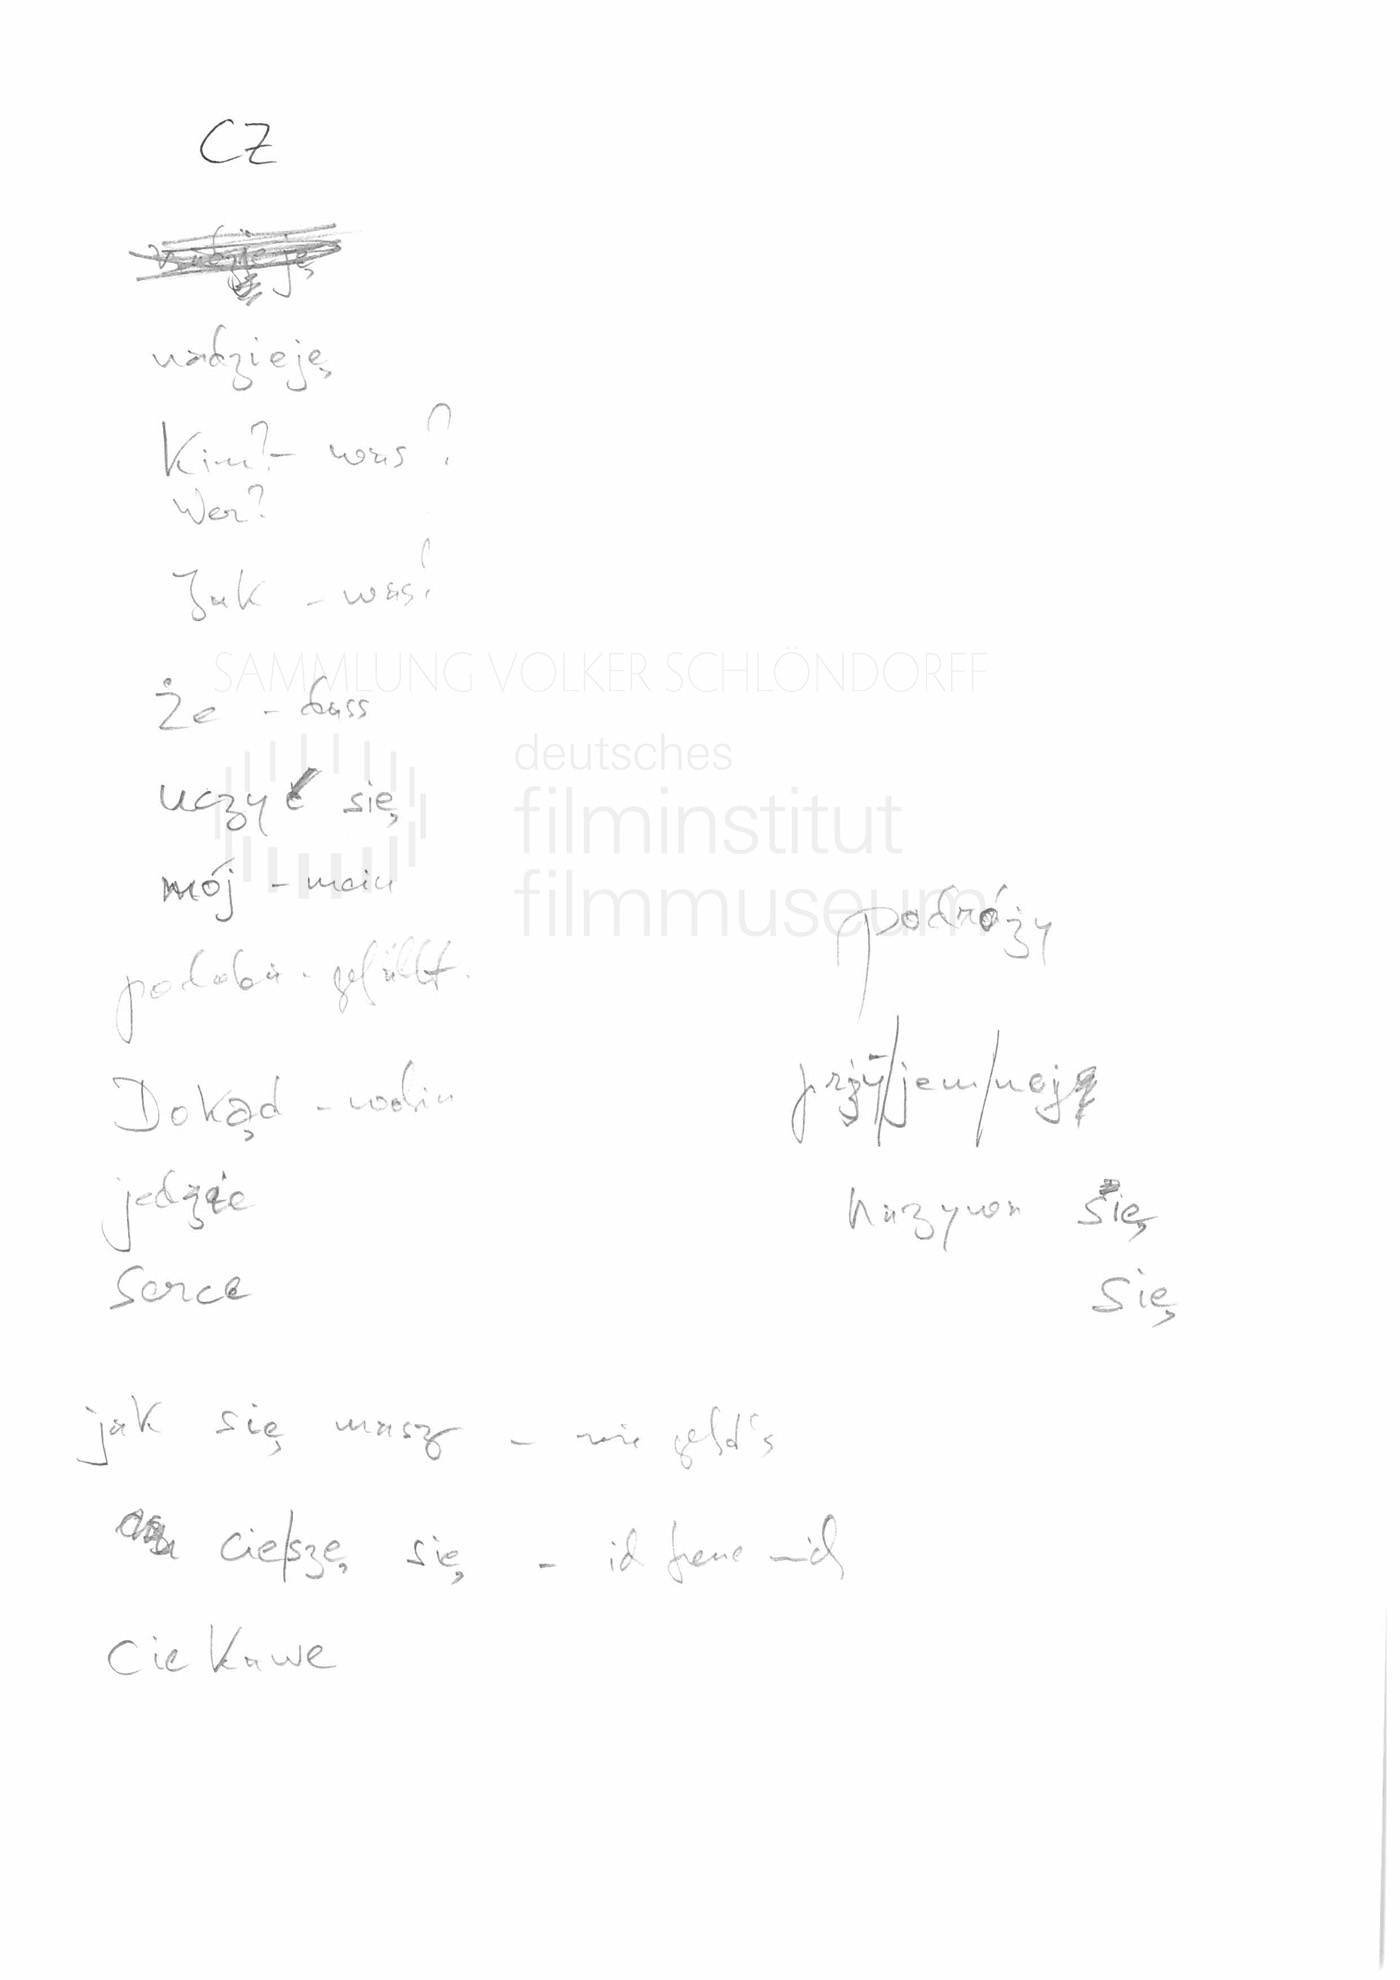 STRAJK // Vorbereitungsmaterial / Polnischunterricht, 19